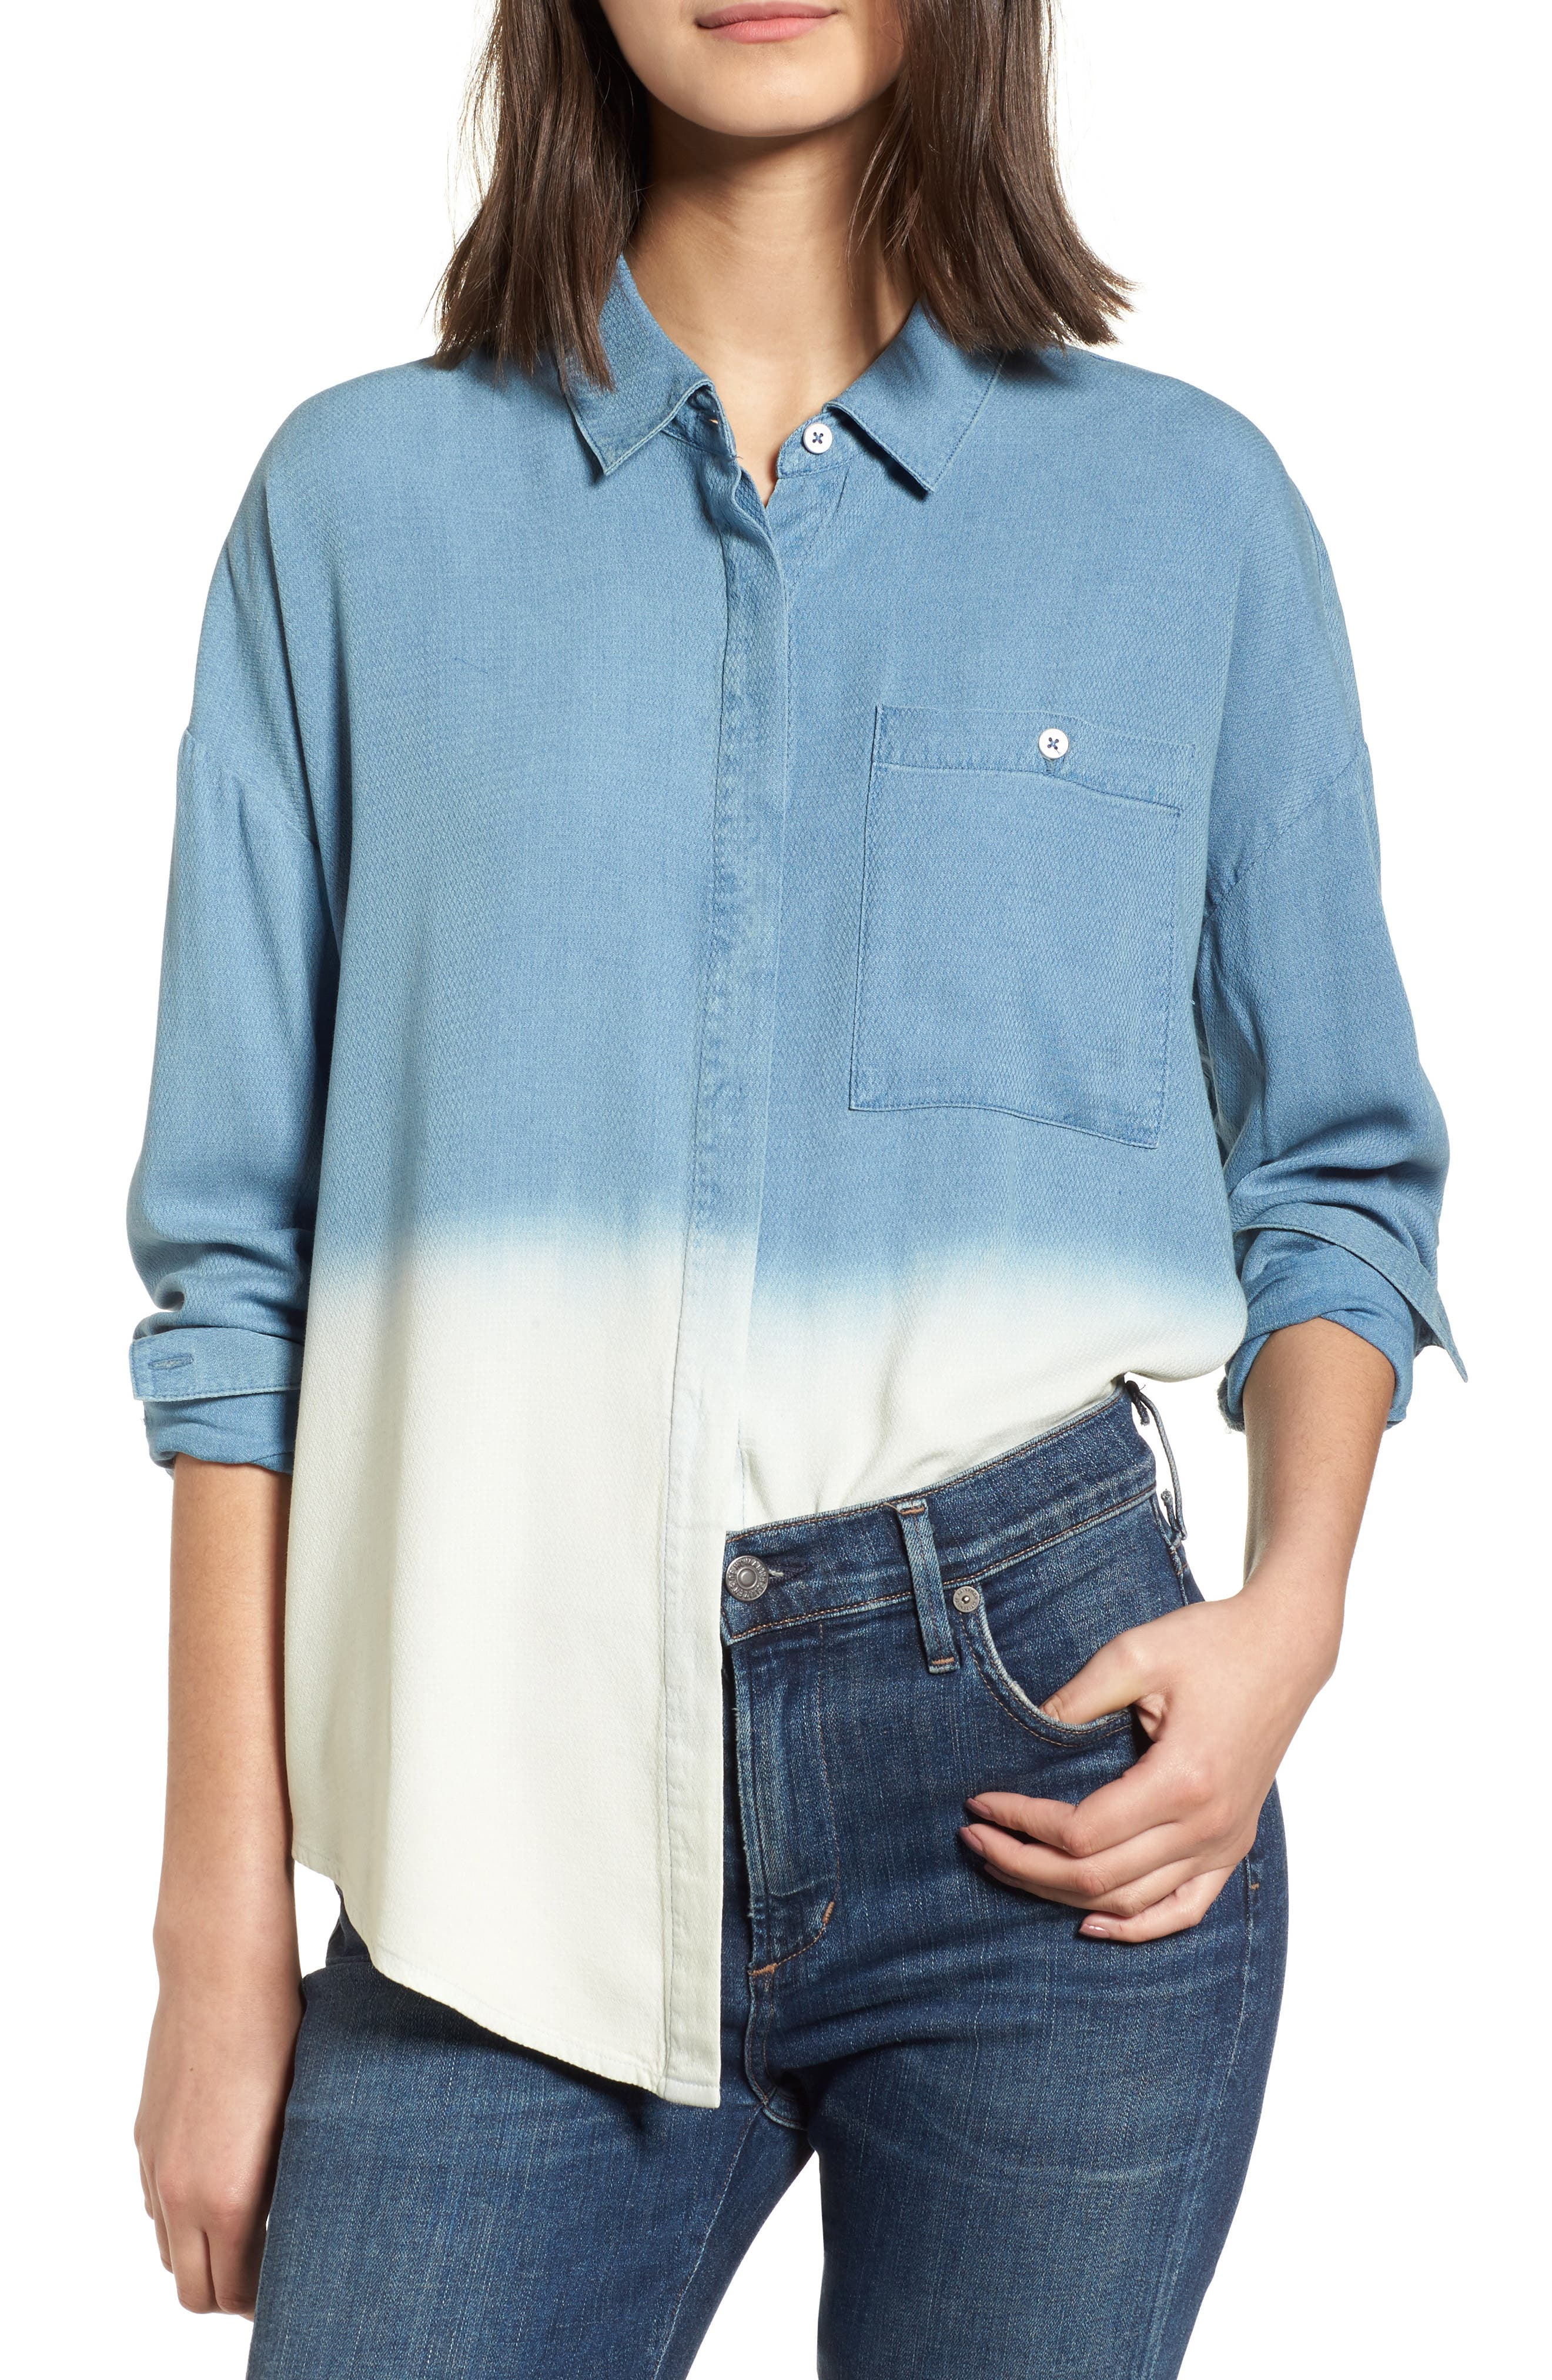 Splendid Ombré Shirt